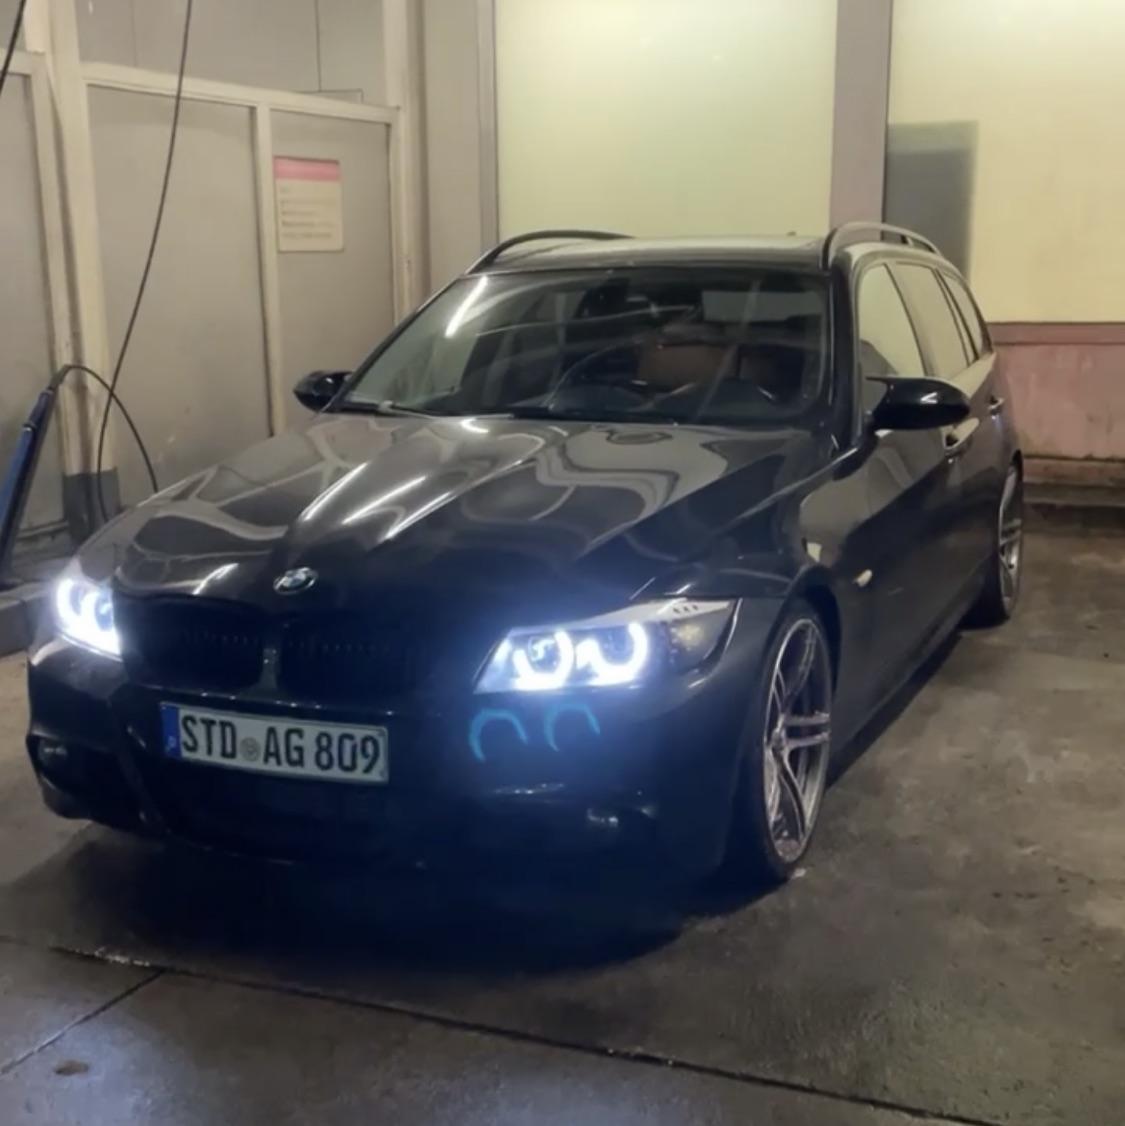 N47 Kettenriss Rebuild + Vid / 320d > 335 FL Umbau - 3er BMW - E90 / E91 / E92 / E93